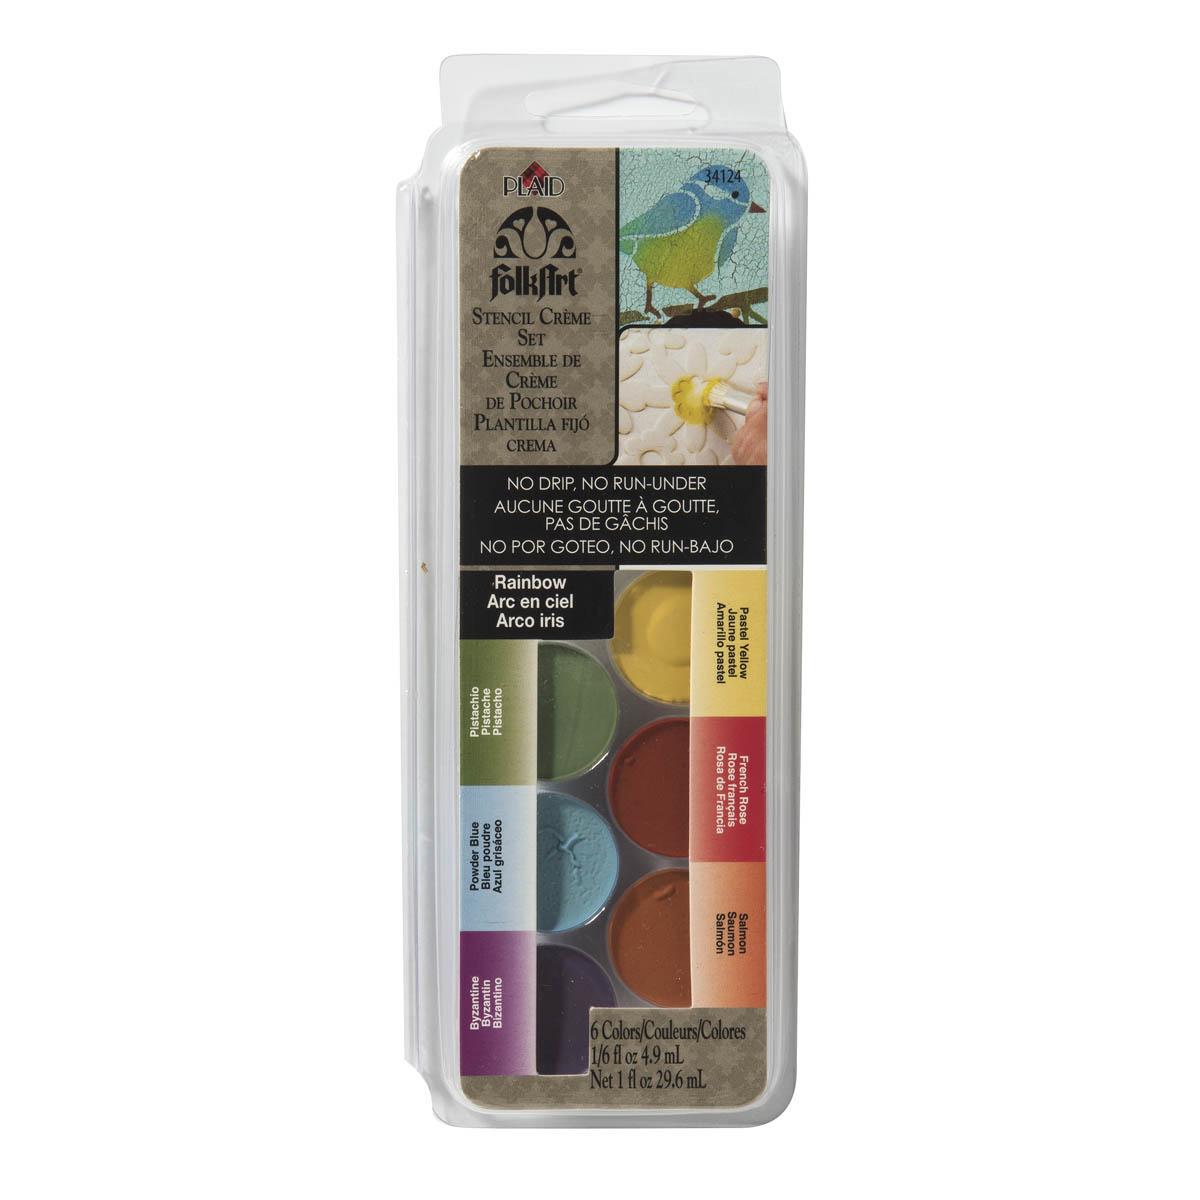 FolkArt ® Dry Brush Stencil Creme Set - Rainbow